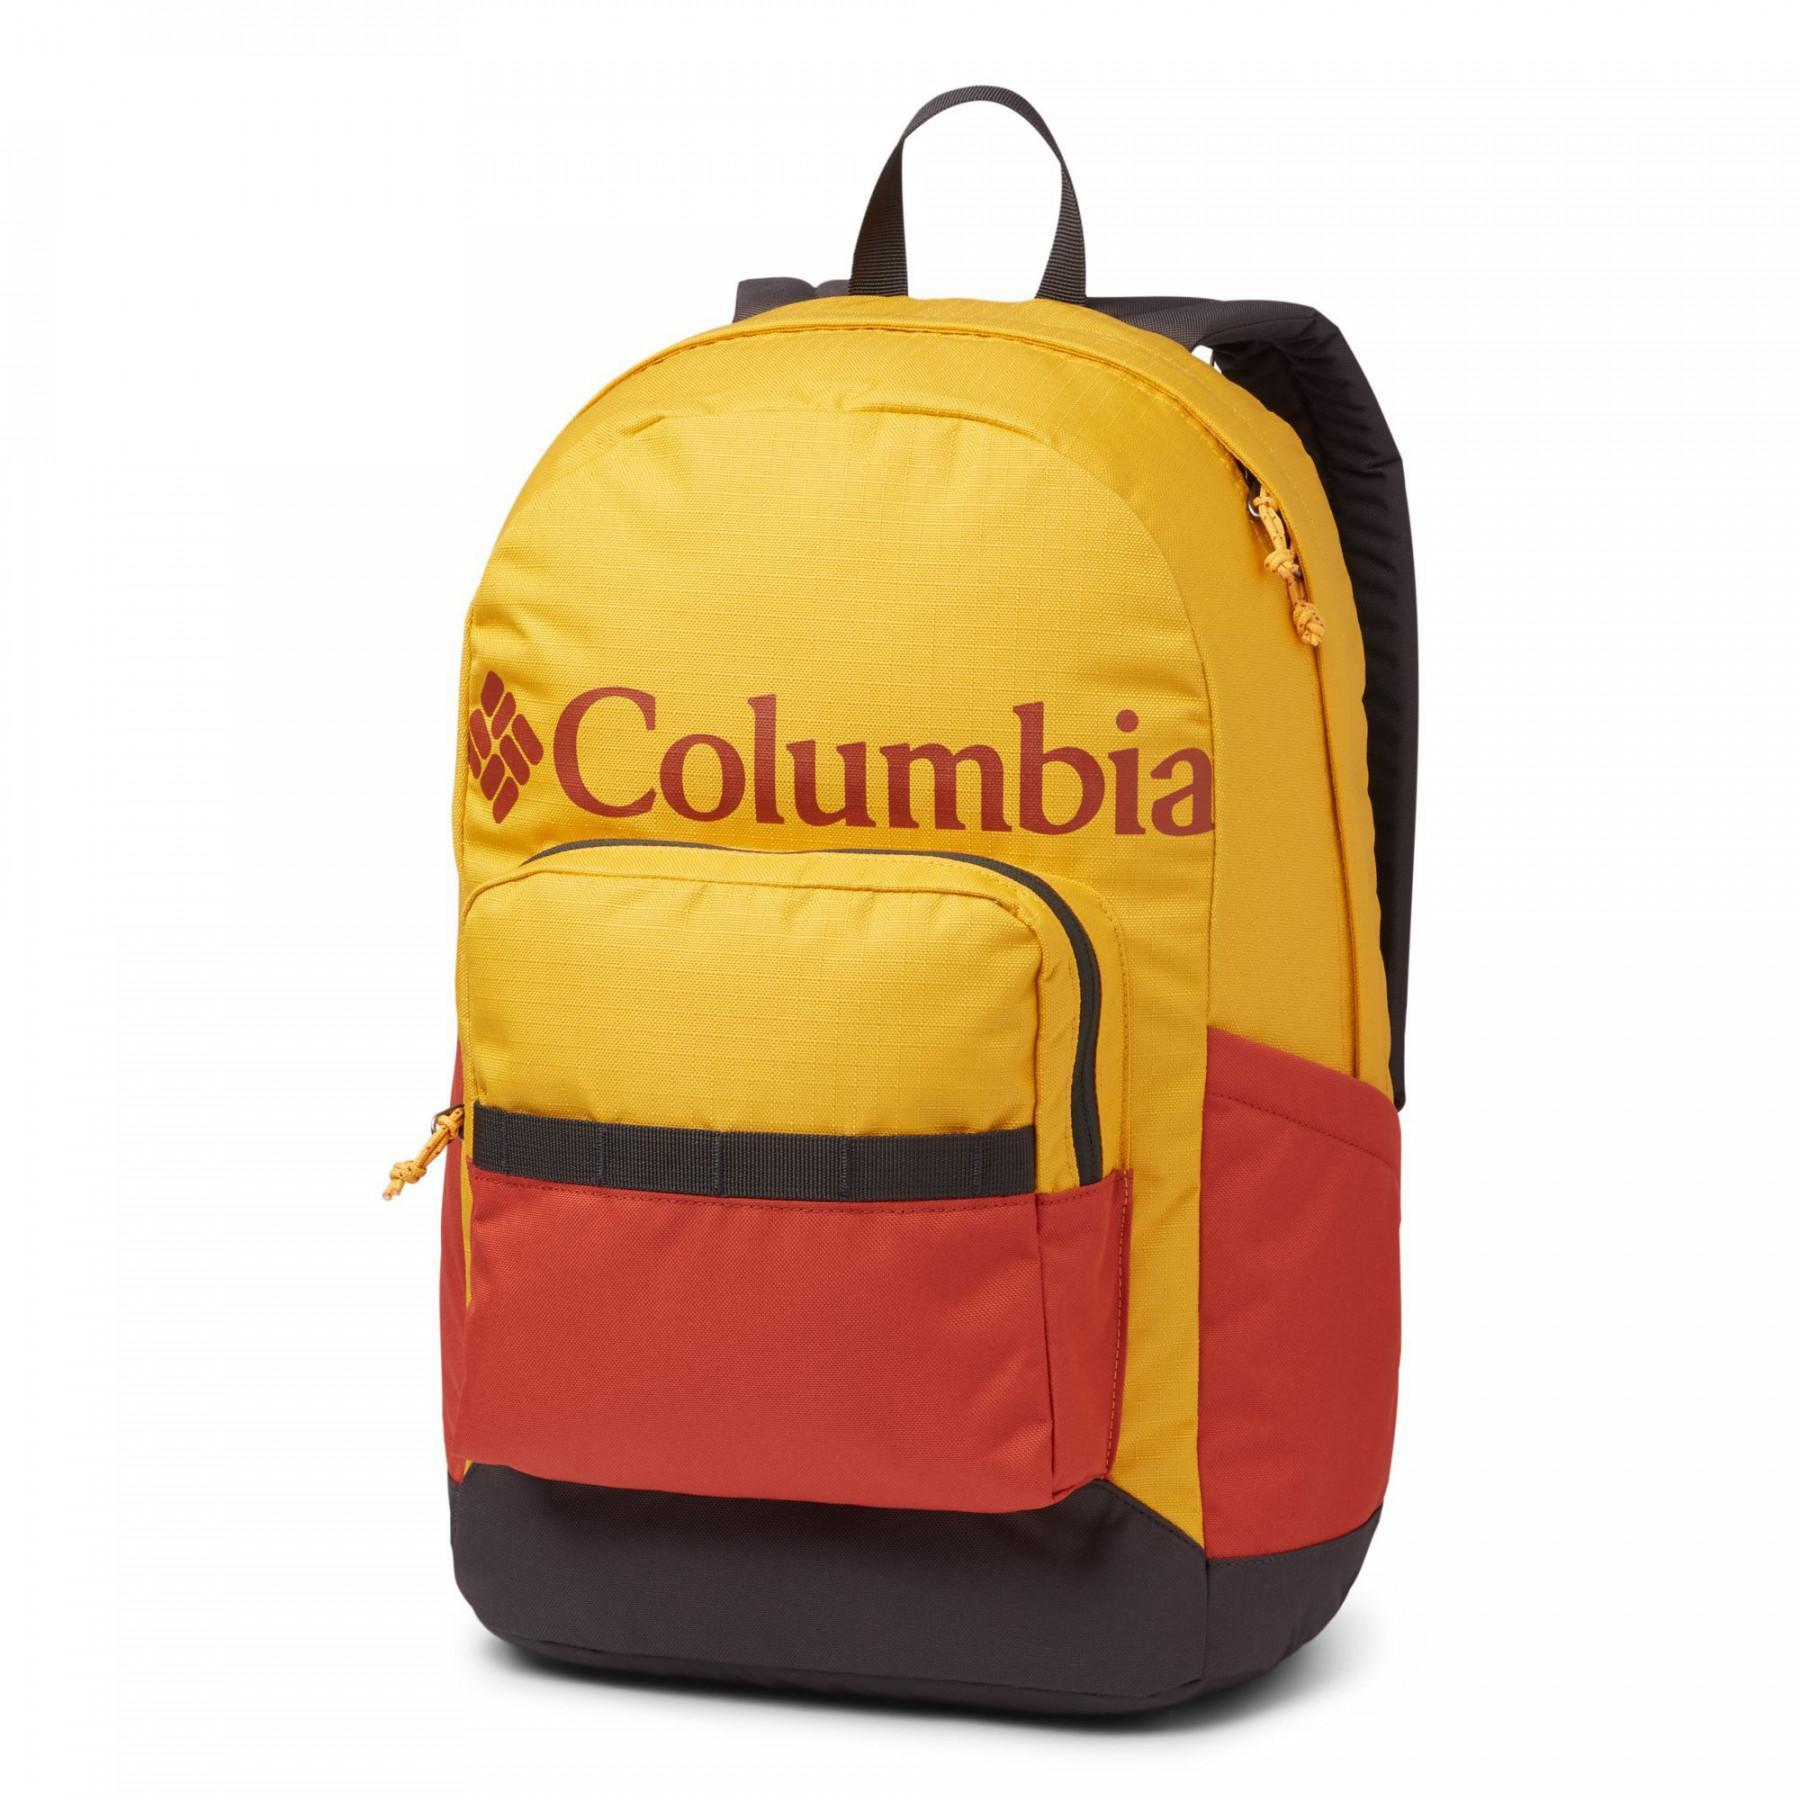 Backpack Columbia Zigzag 22L